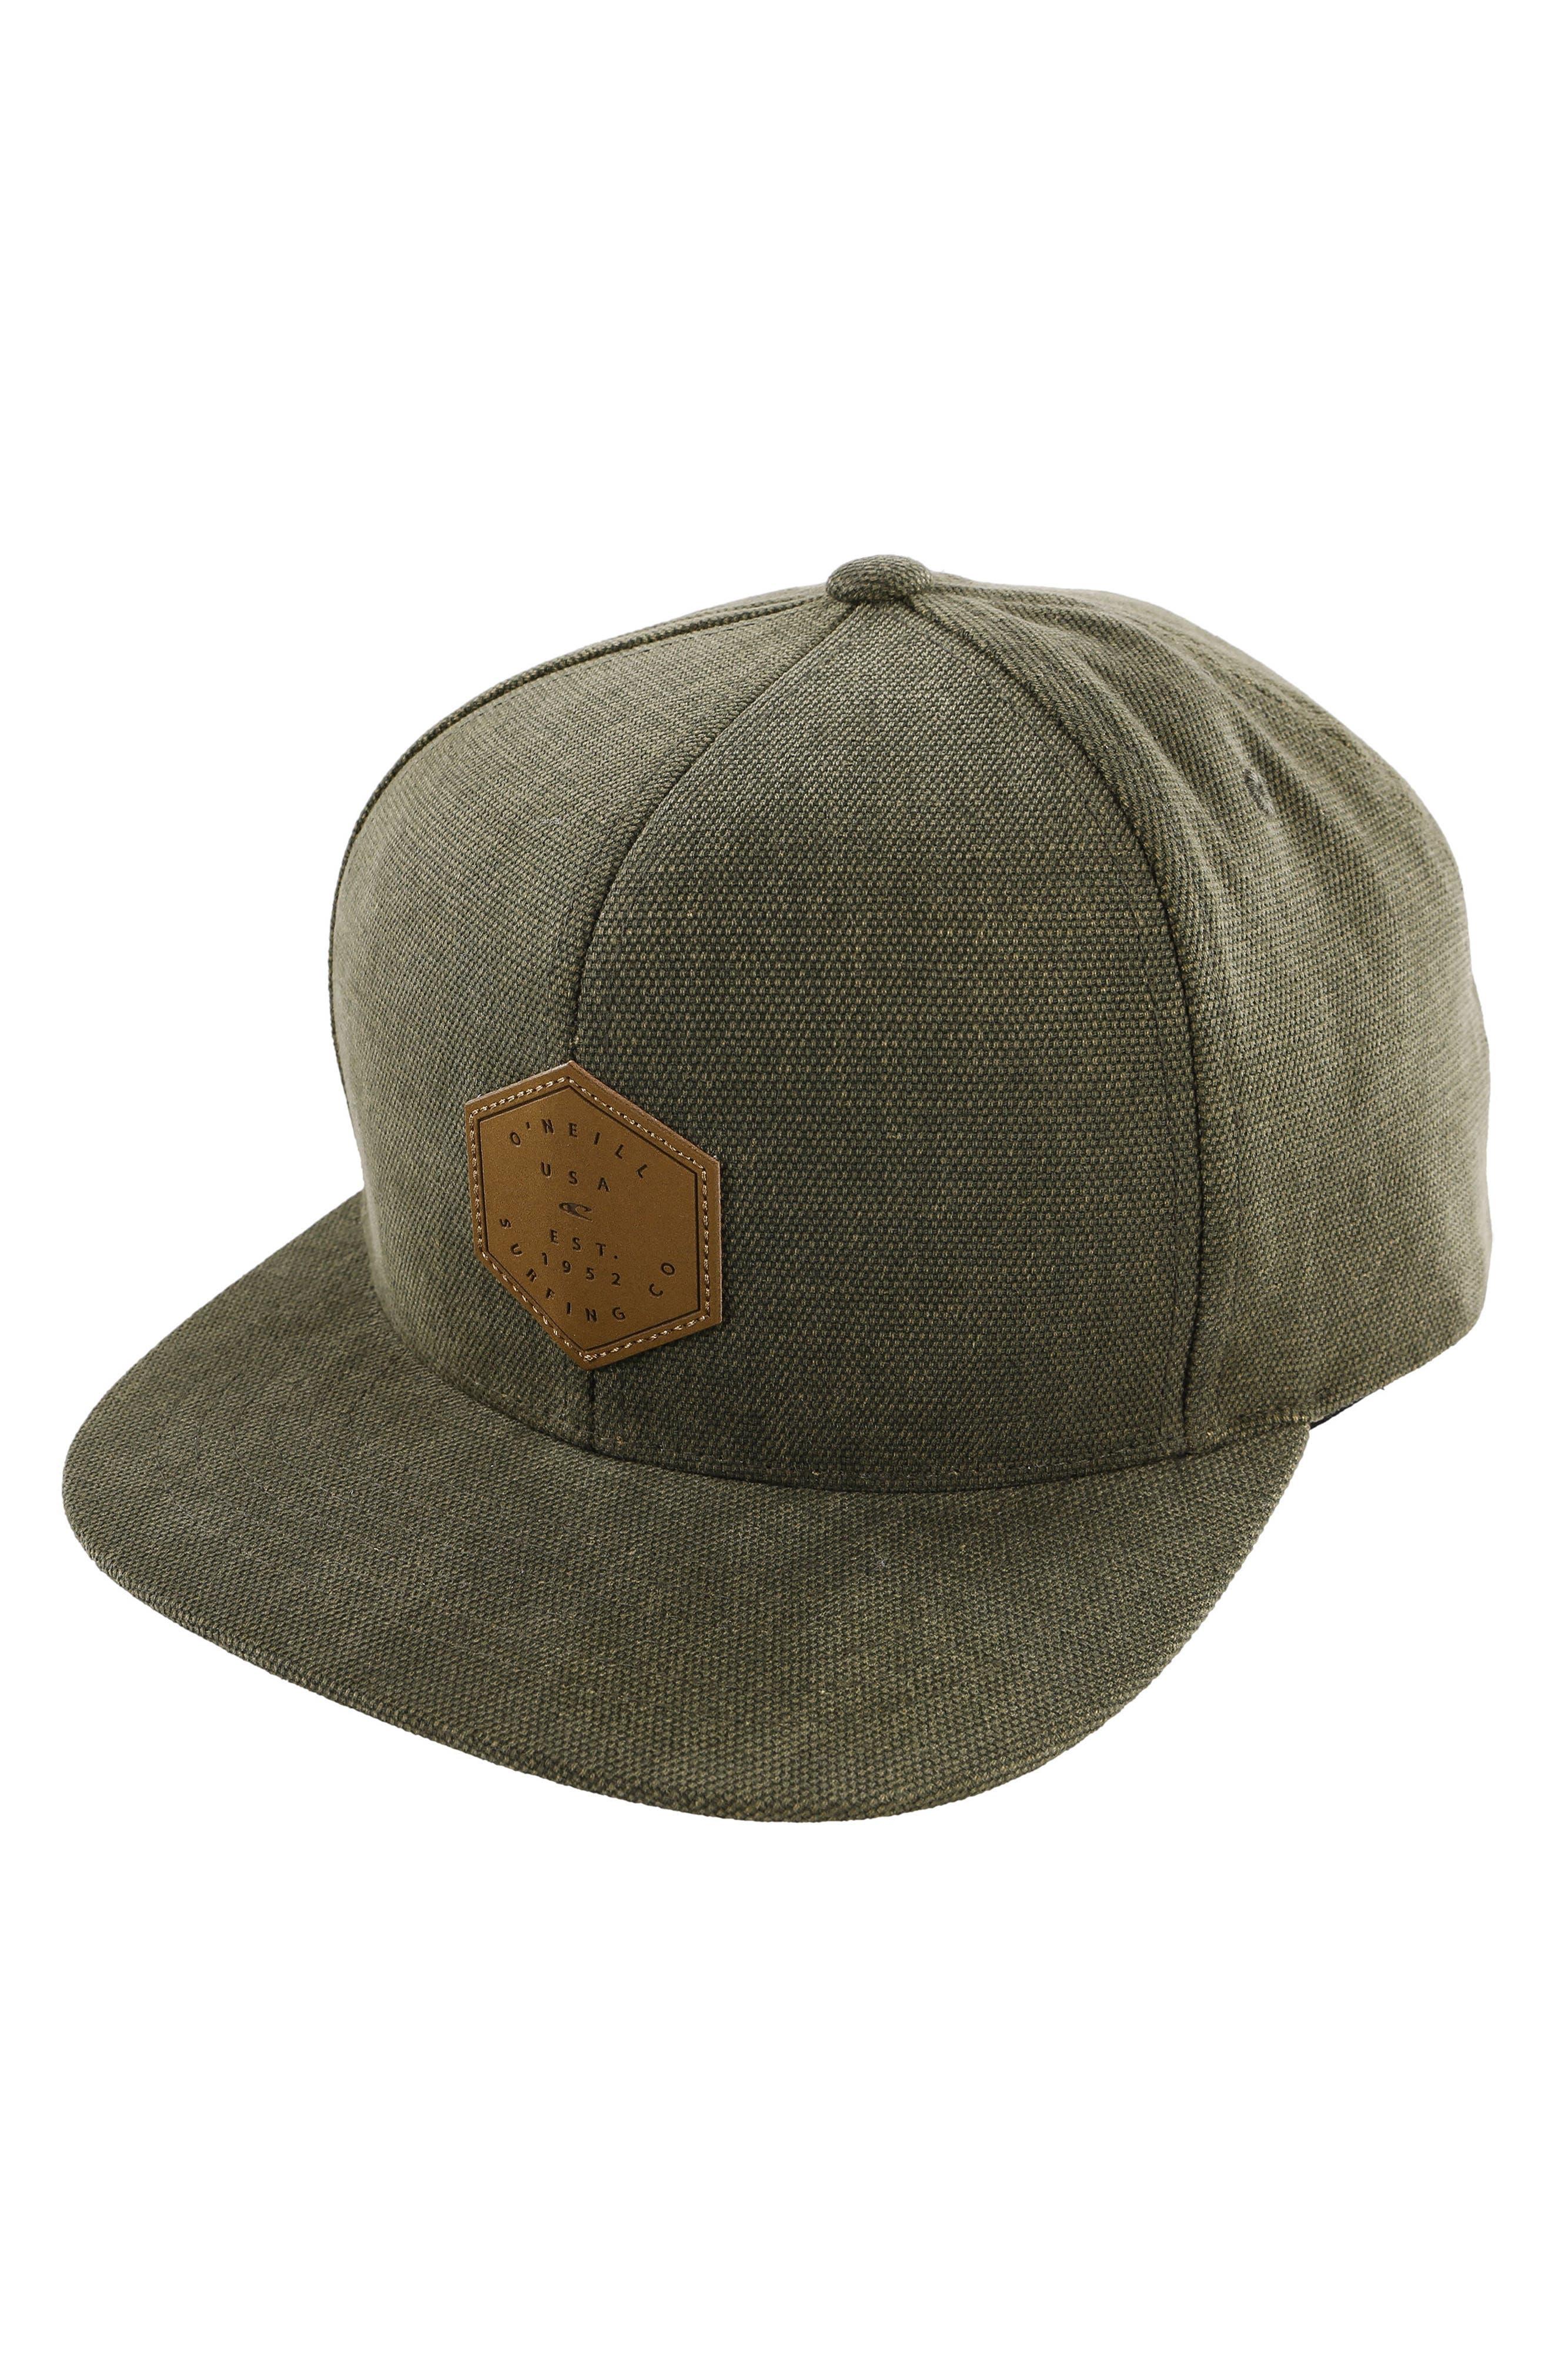 Lowtide Snapback Baseball Cap,                             Main thumbnail 1, color,                             Army